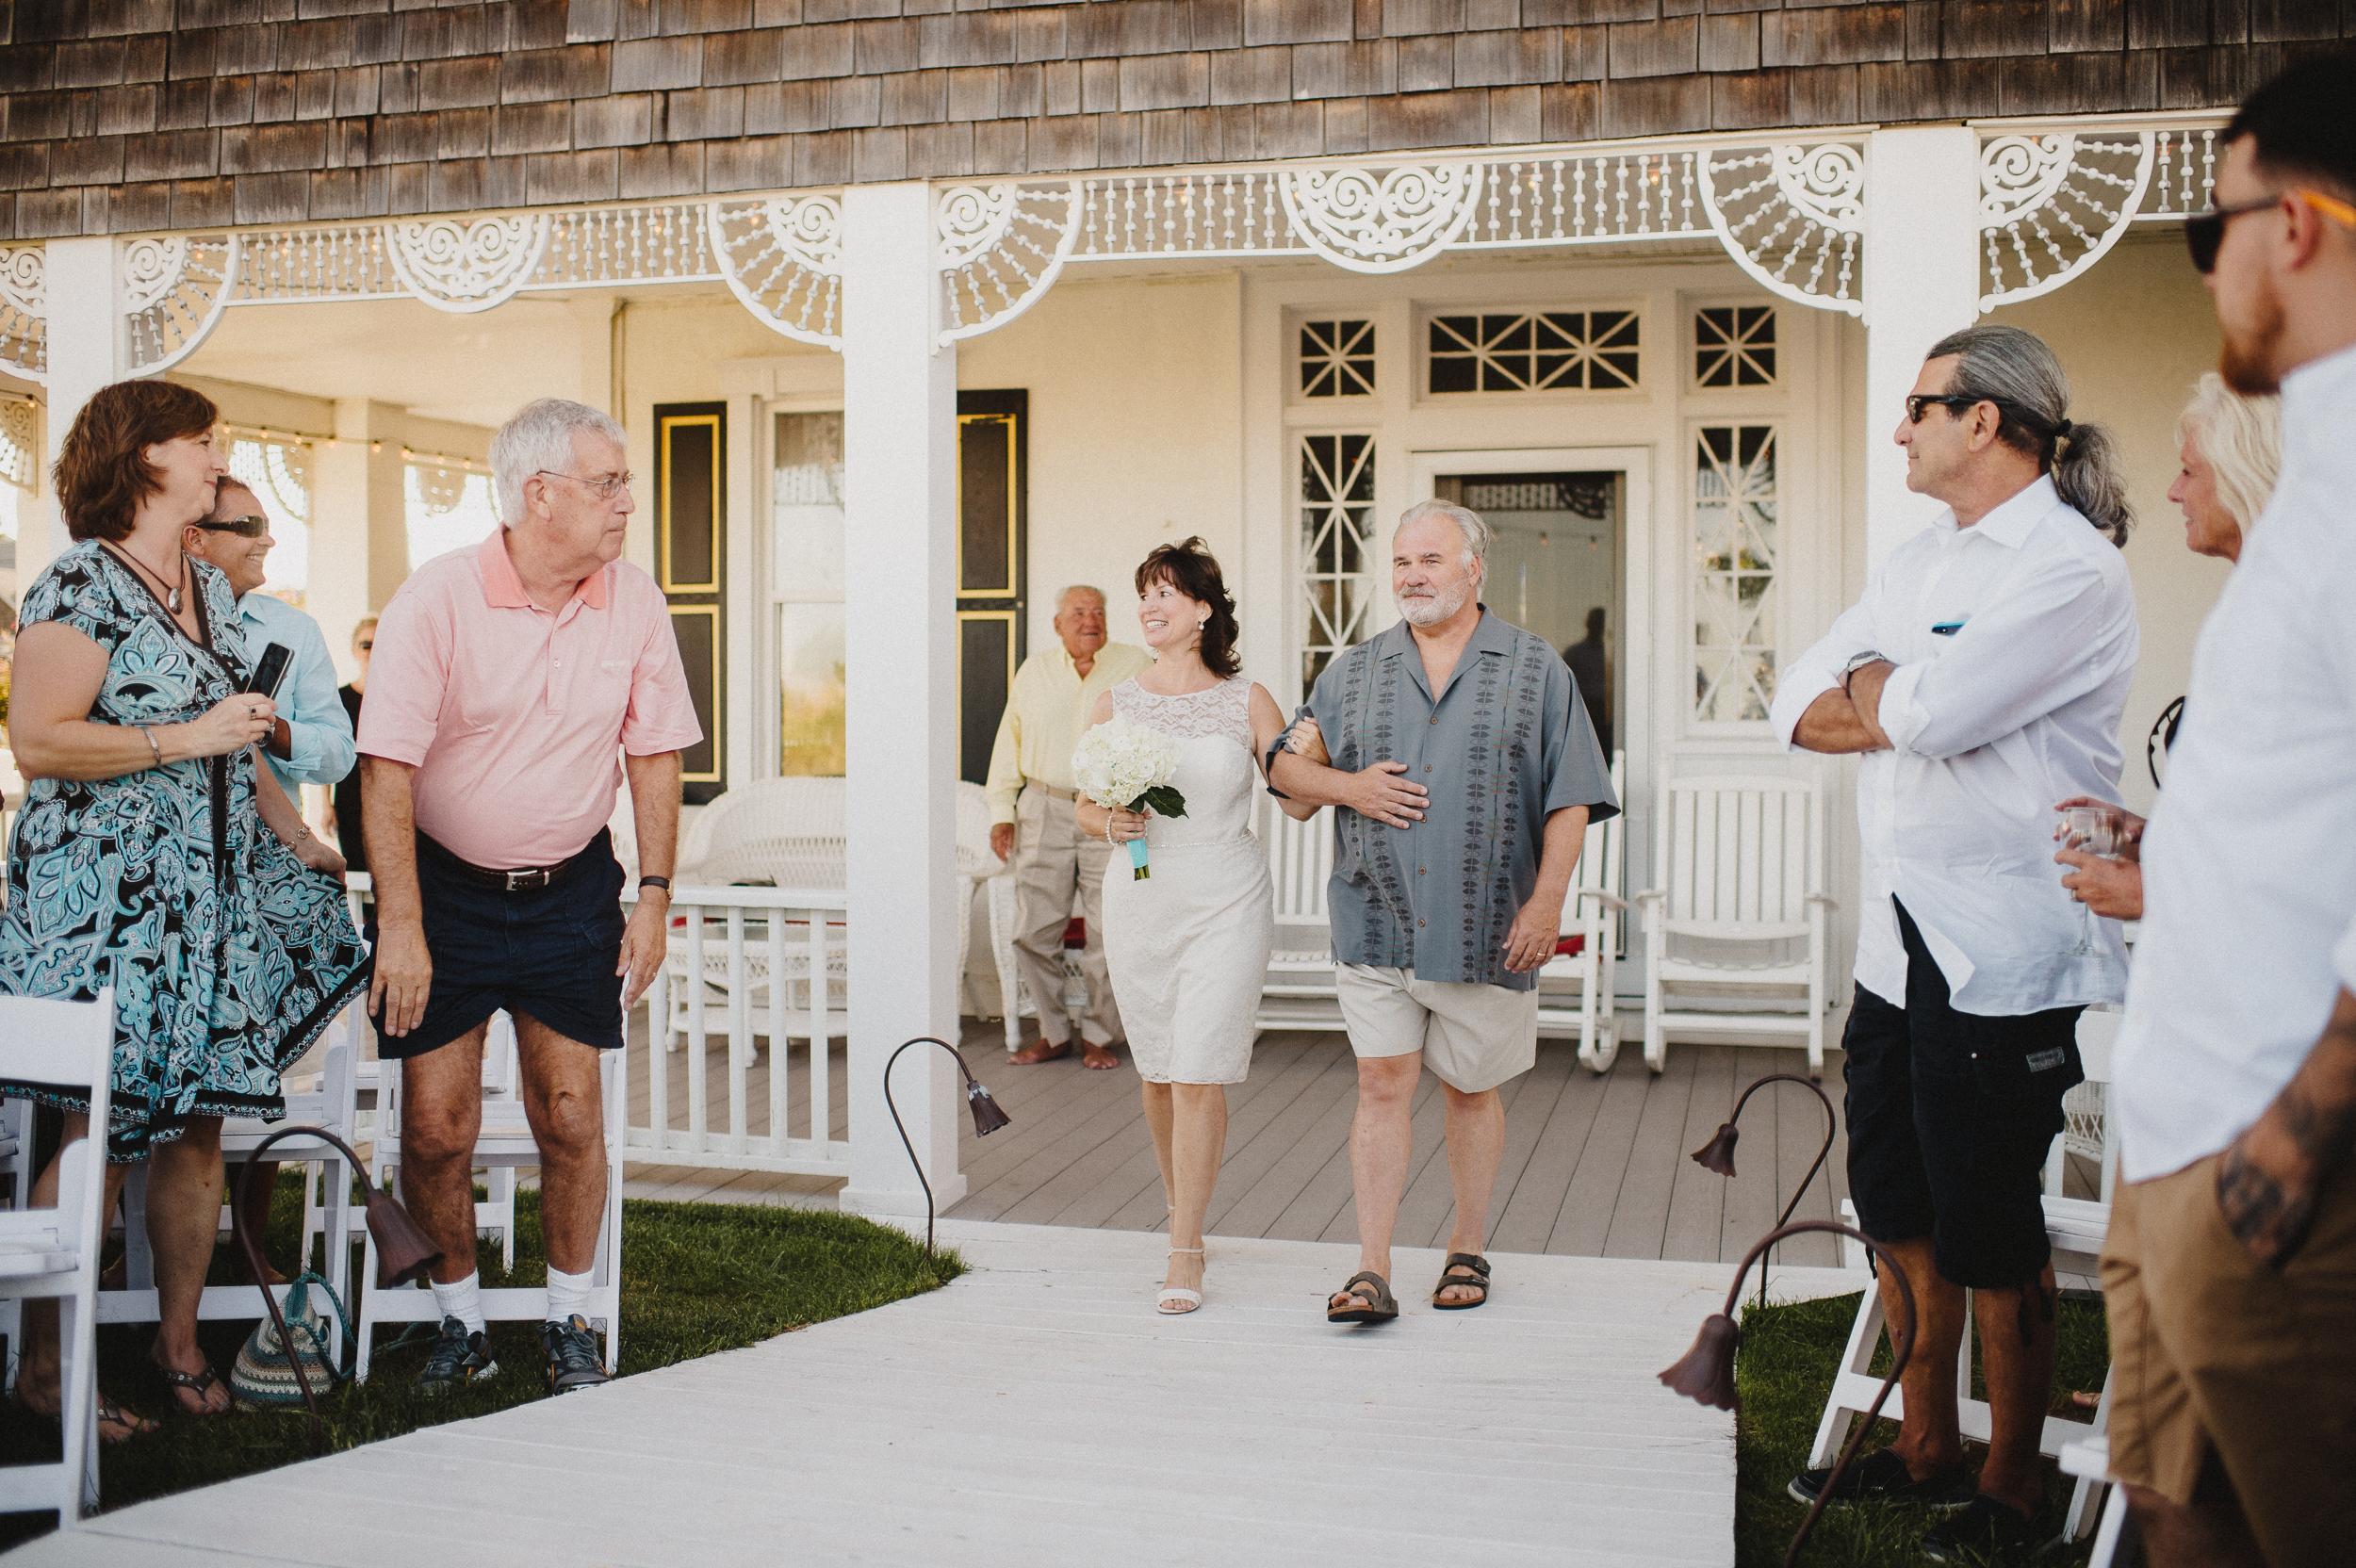 bethany-beach-wedding-photographer-20.jpg